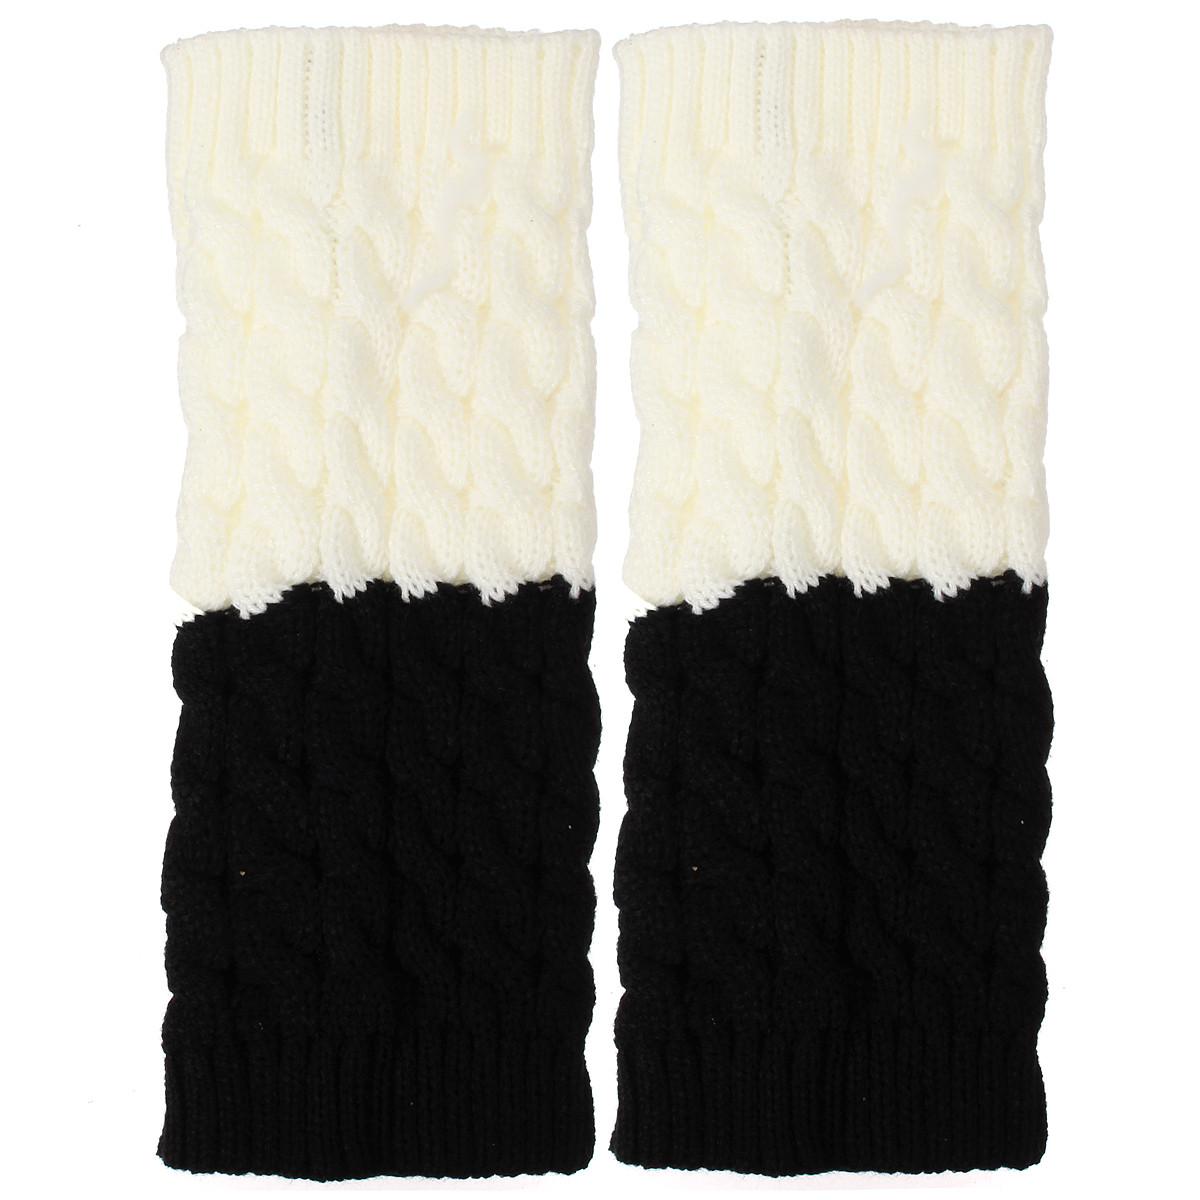 Women Ladies Knitted Thigh High Leg Warmers Socks Winter Boot Short Cuff Socks